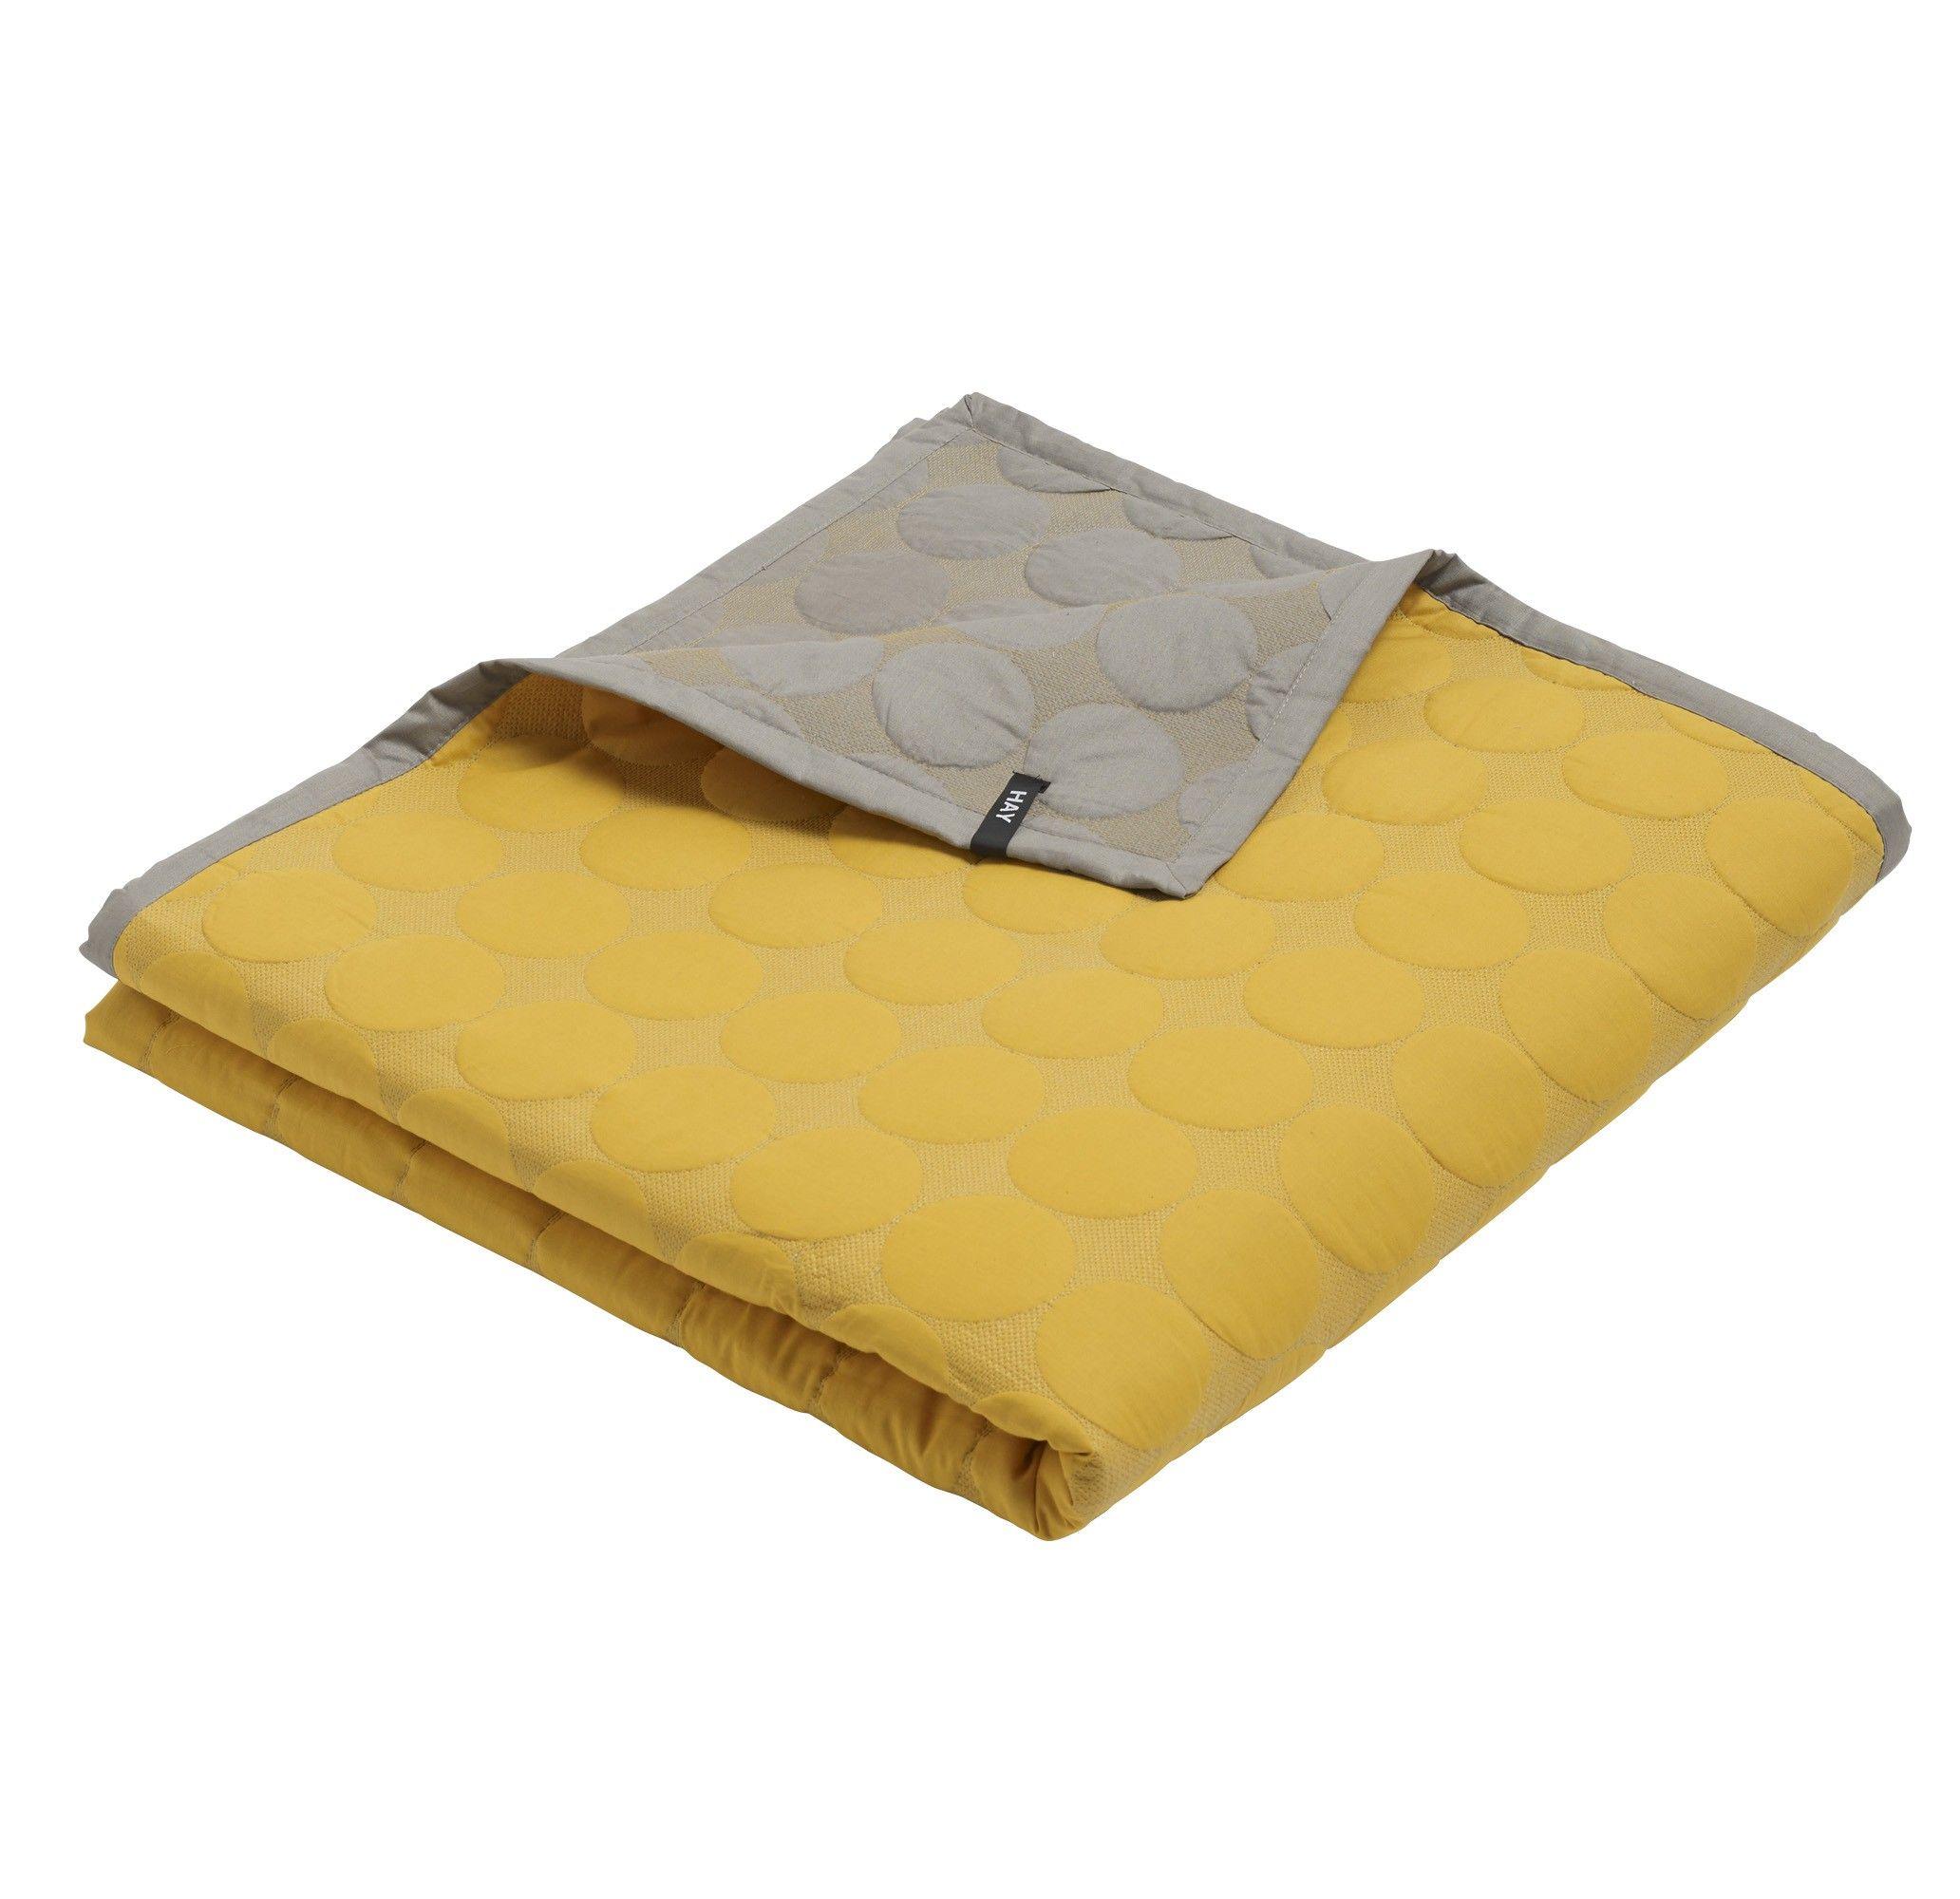 couvre lit hay Couvre lit MEGA DOT jaune   HAY | Bed linen | Pinterest | Bed  couvre lit hay